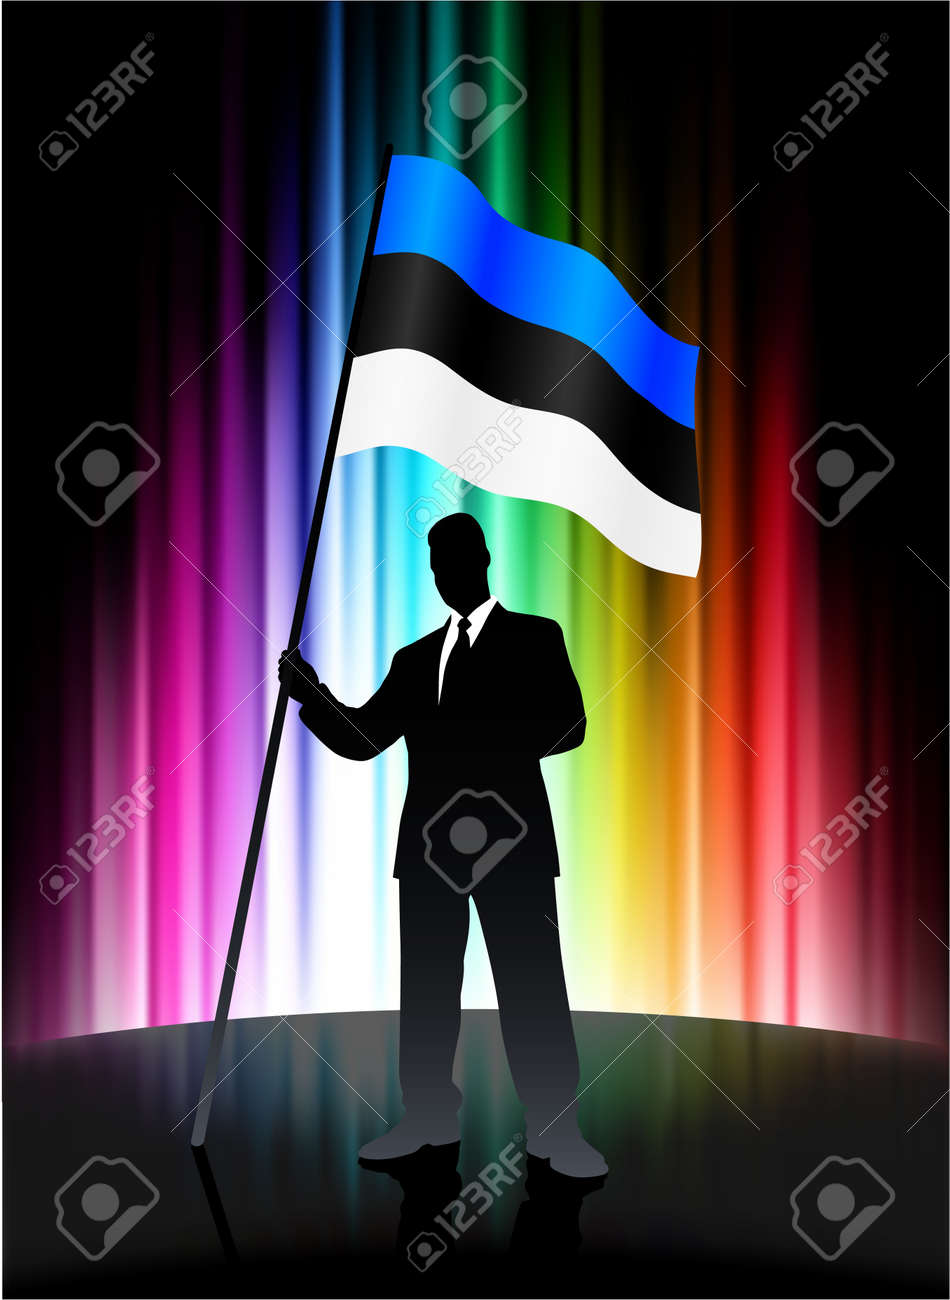 Estonia Flag with Businessman on Abstract Spectrum BackgroundOriginal Illustration Stock Illustration - 7666911